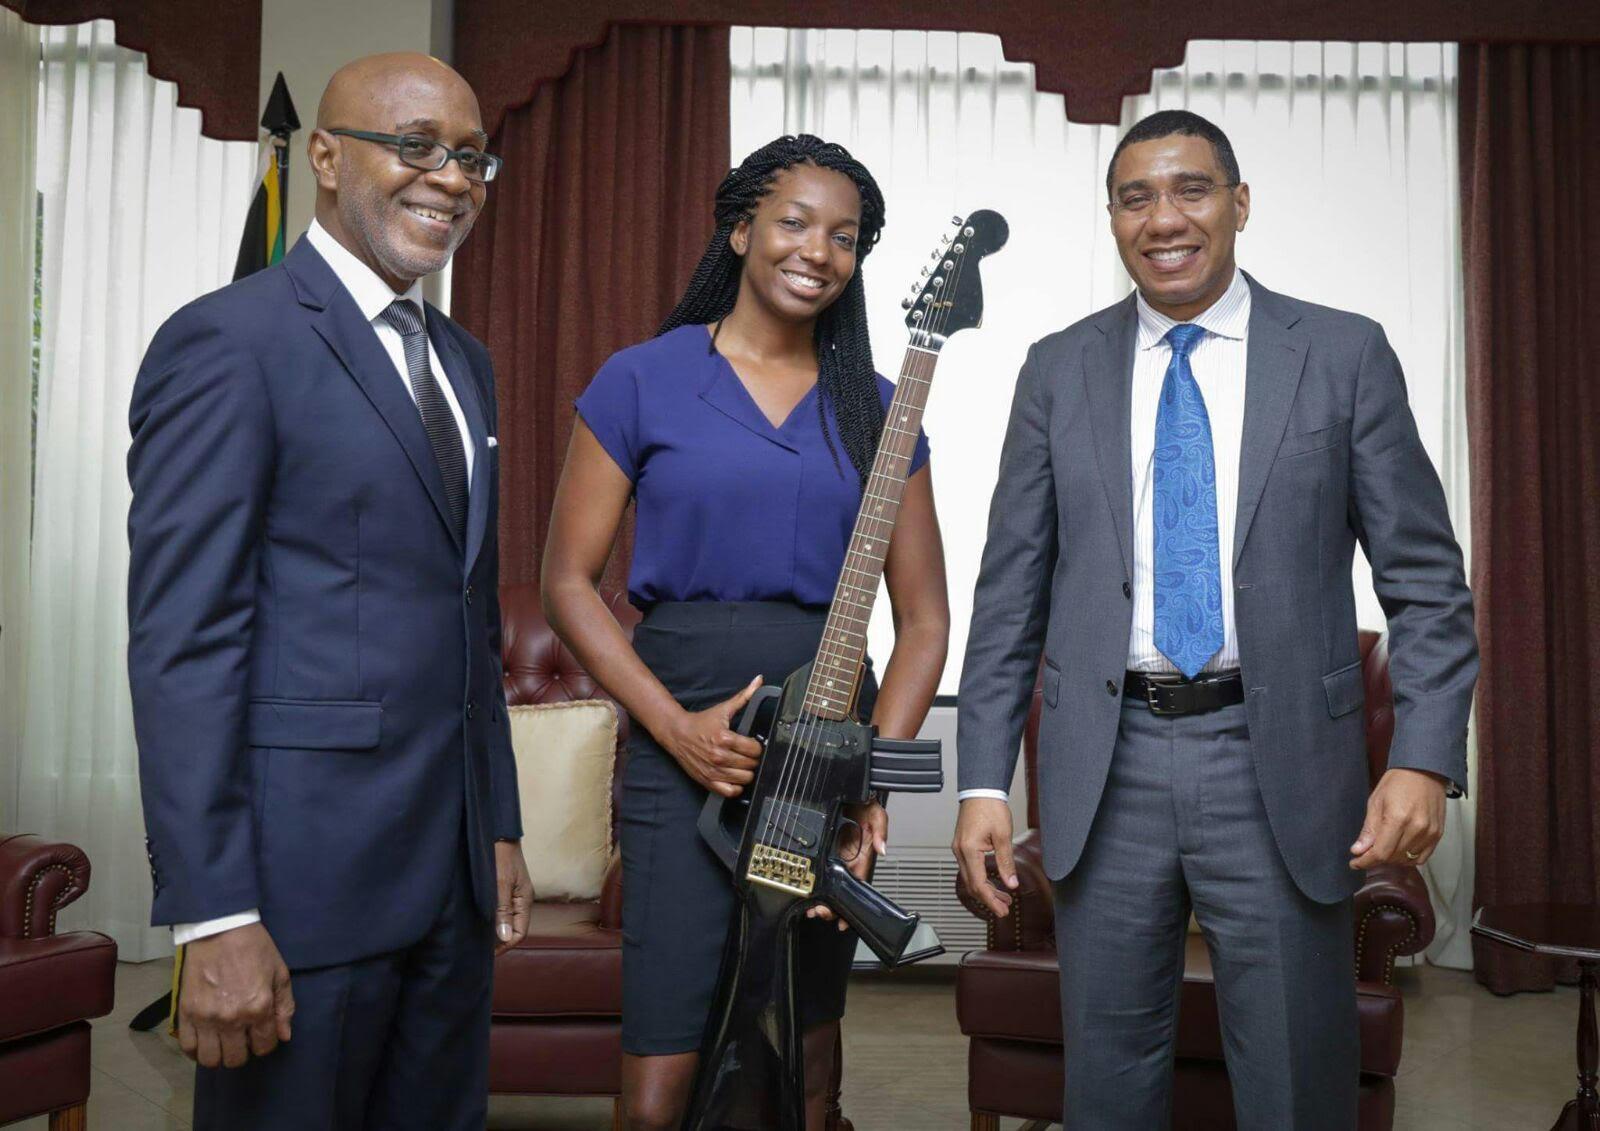 Anti-Pitchfork: NEW MUSEUM IN KINGSTON, JAMAICA TO HONOR LEGENDARY REGGAE MUSICIAN PETER TOSH